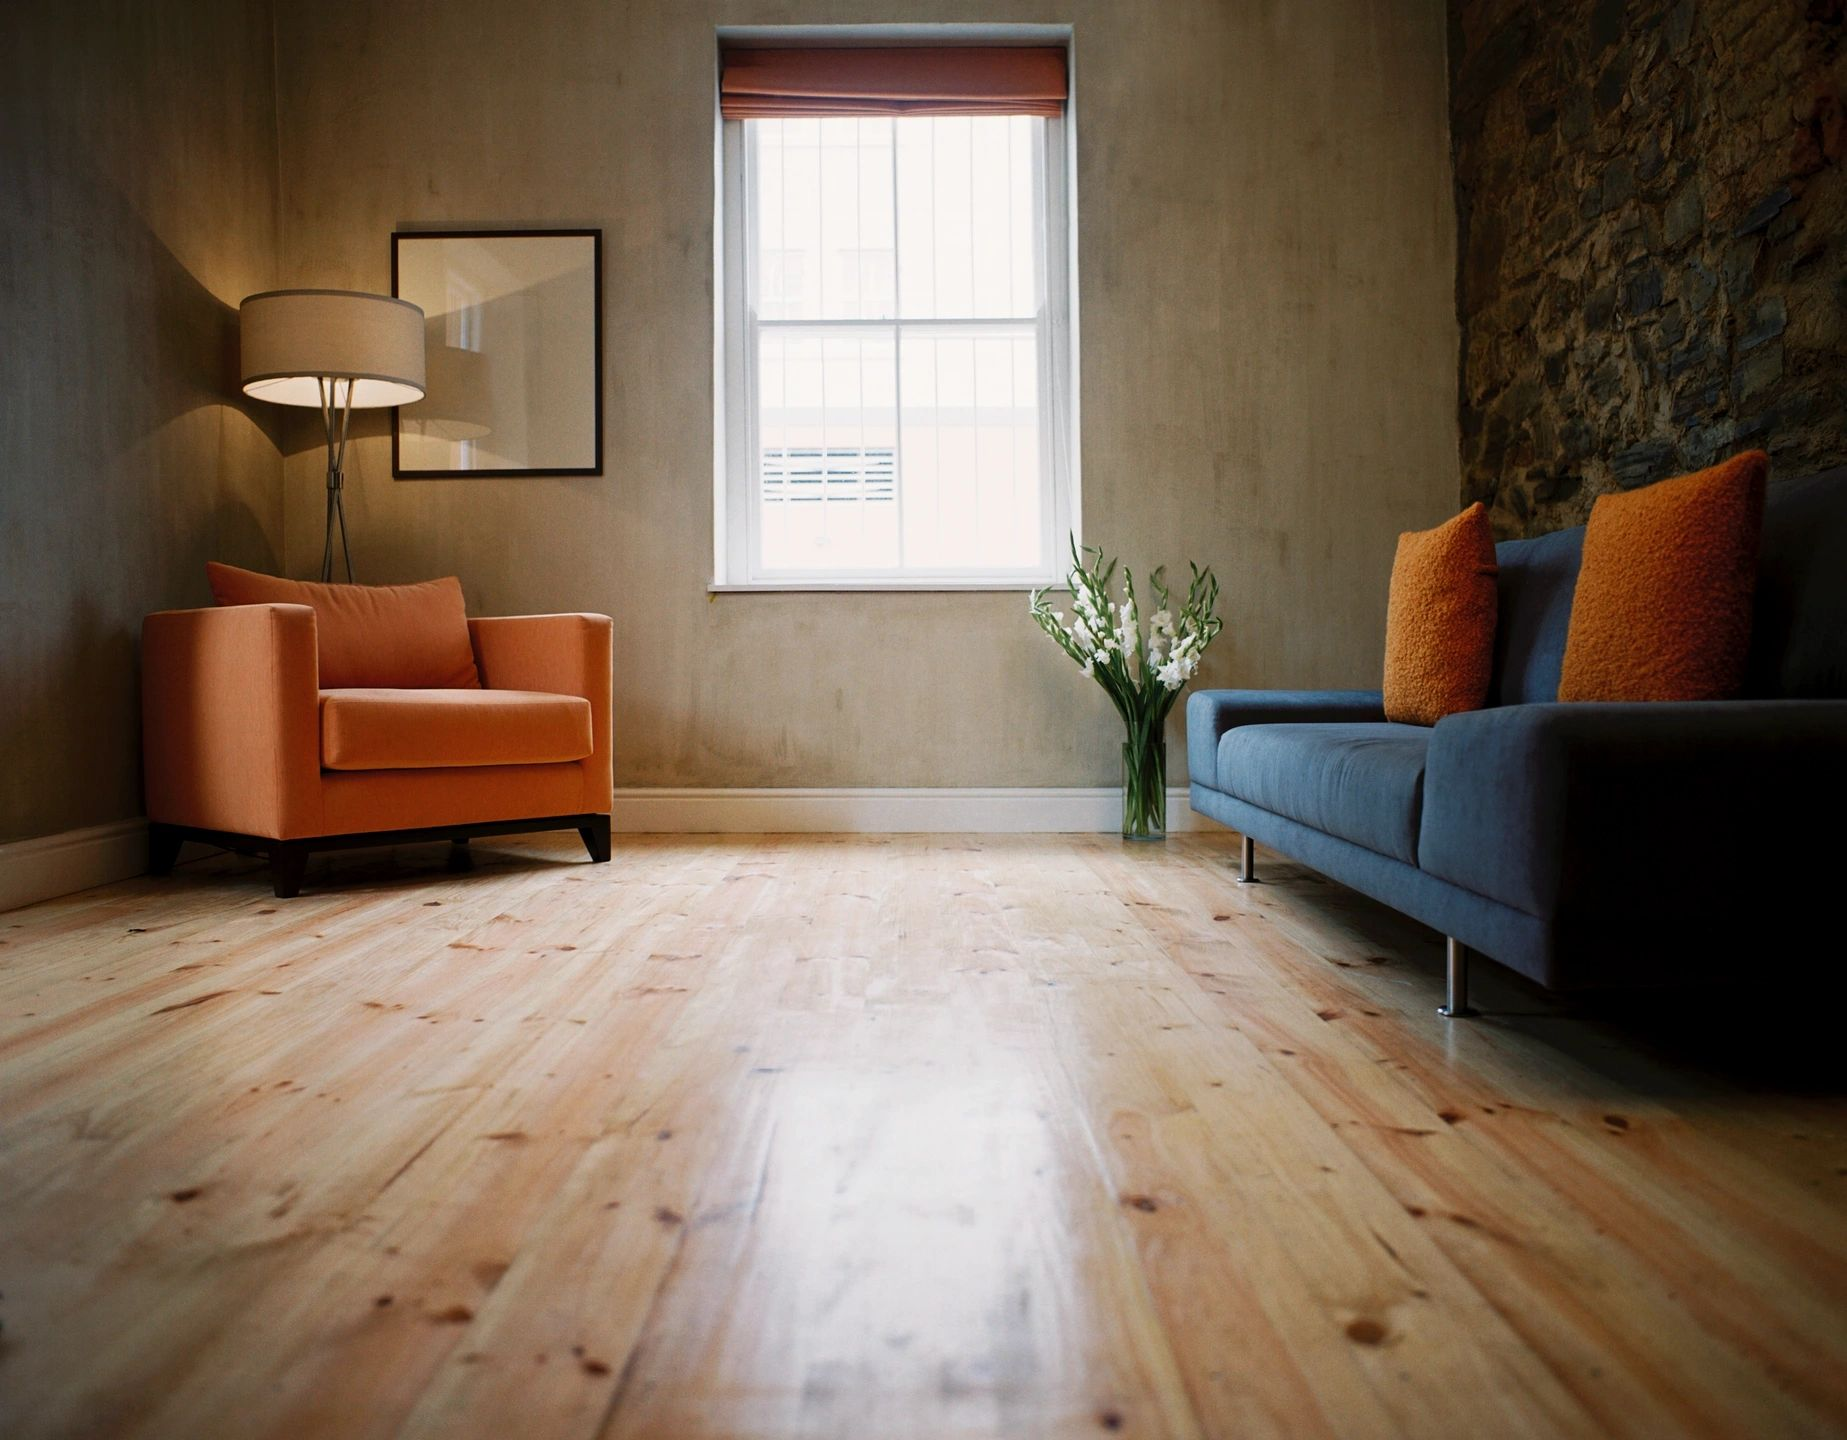 Waterproof Vinyl Flooring | Porcelain Tile | Glass Shower